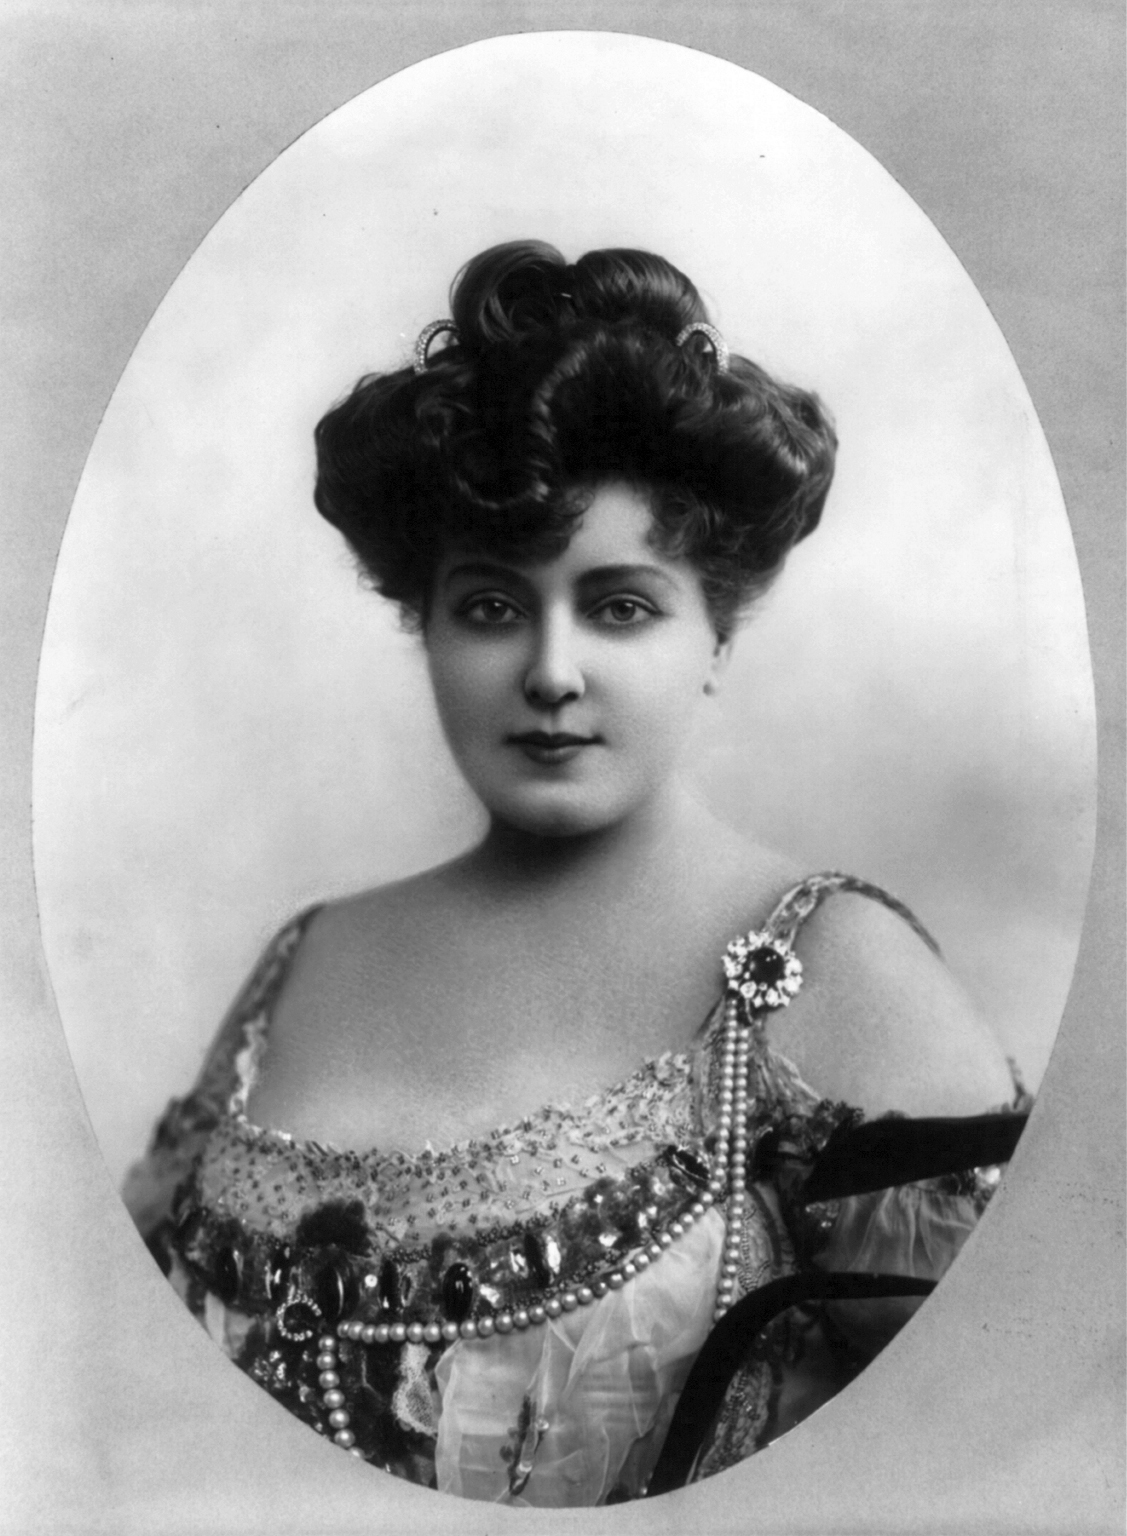 Lillian Russell in 1905. (Photo: Benjamin Falk)